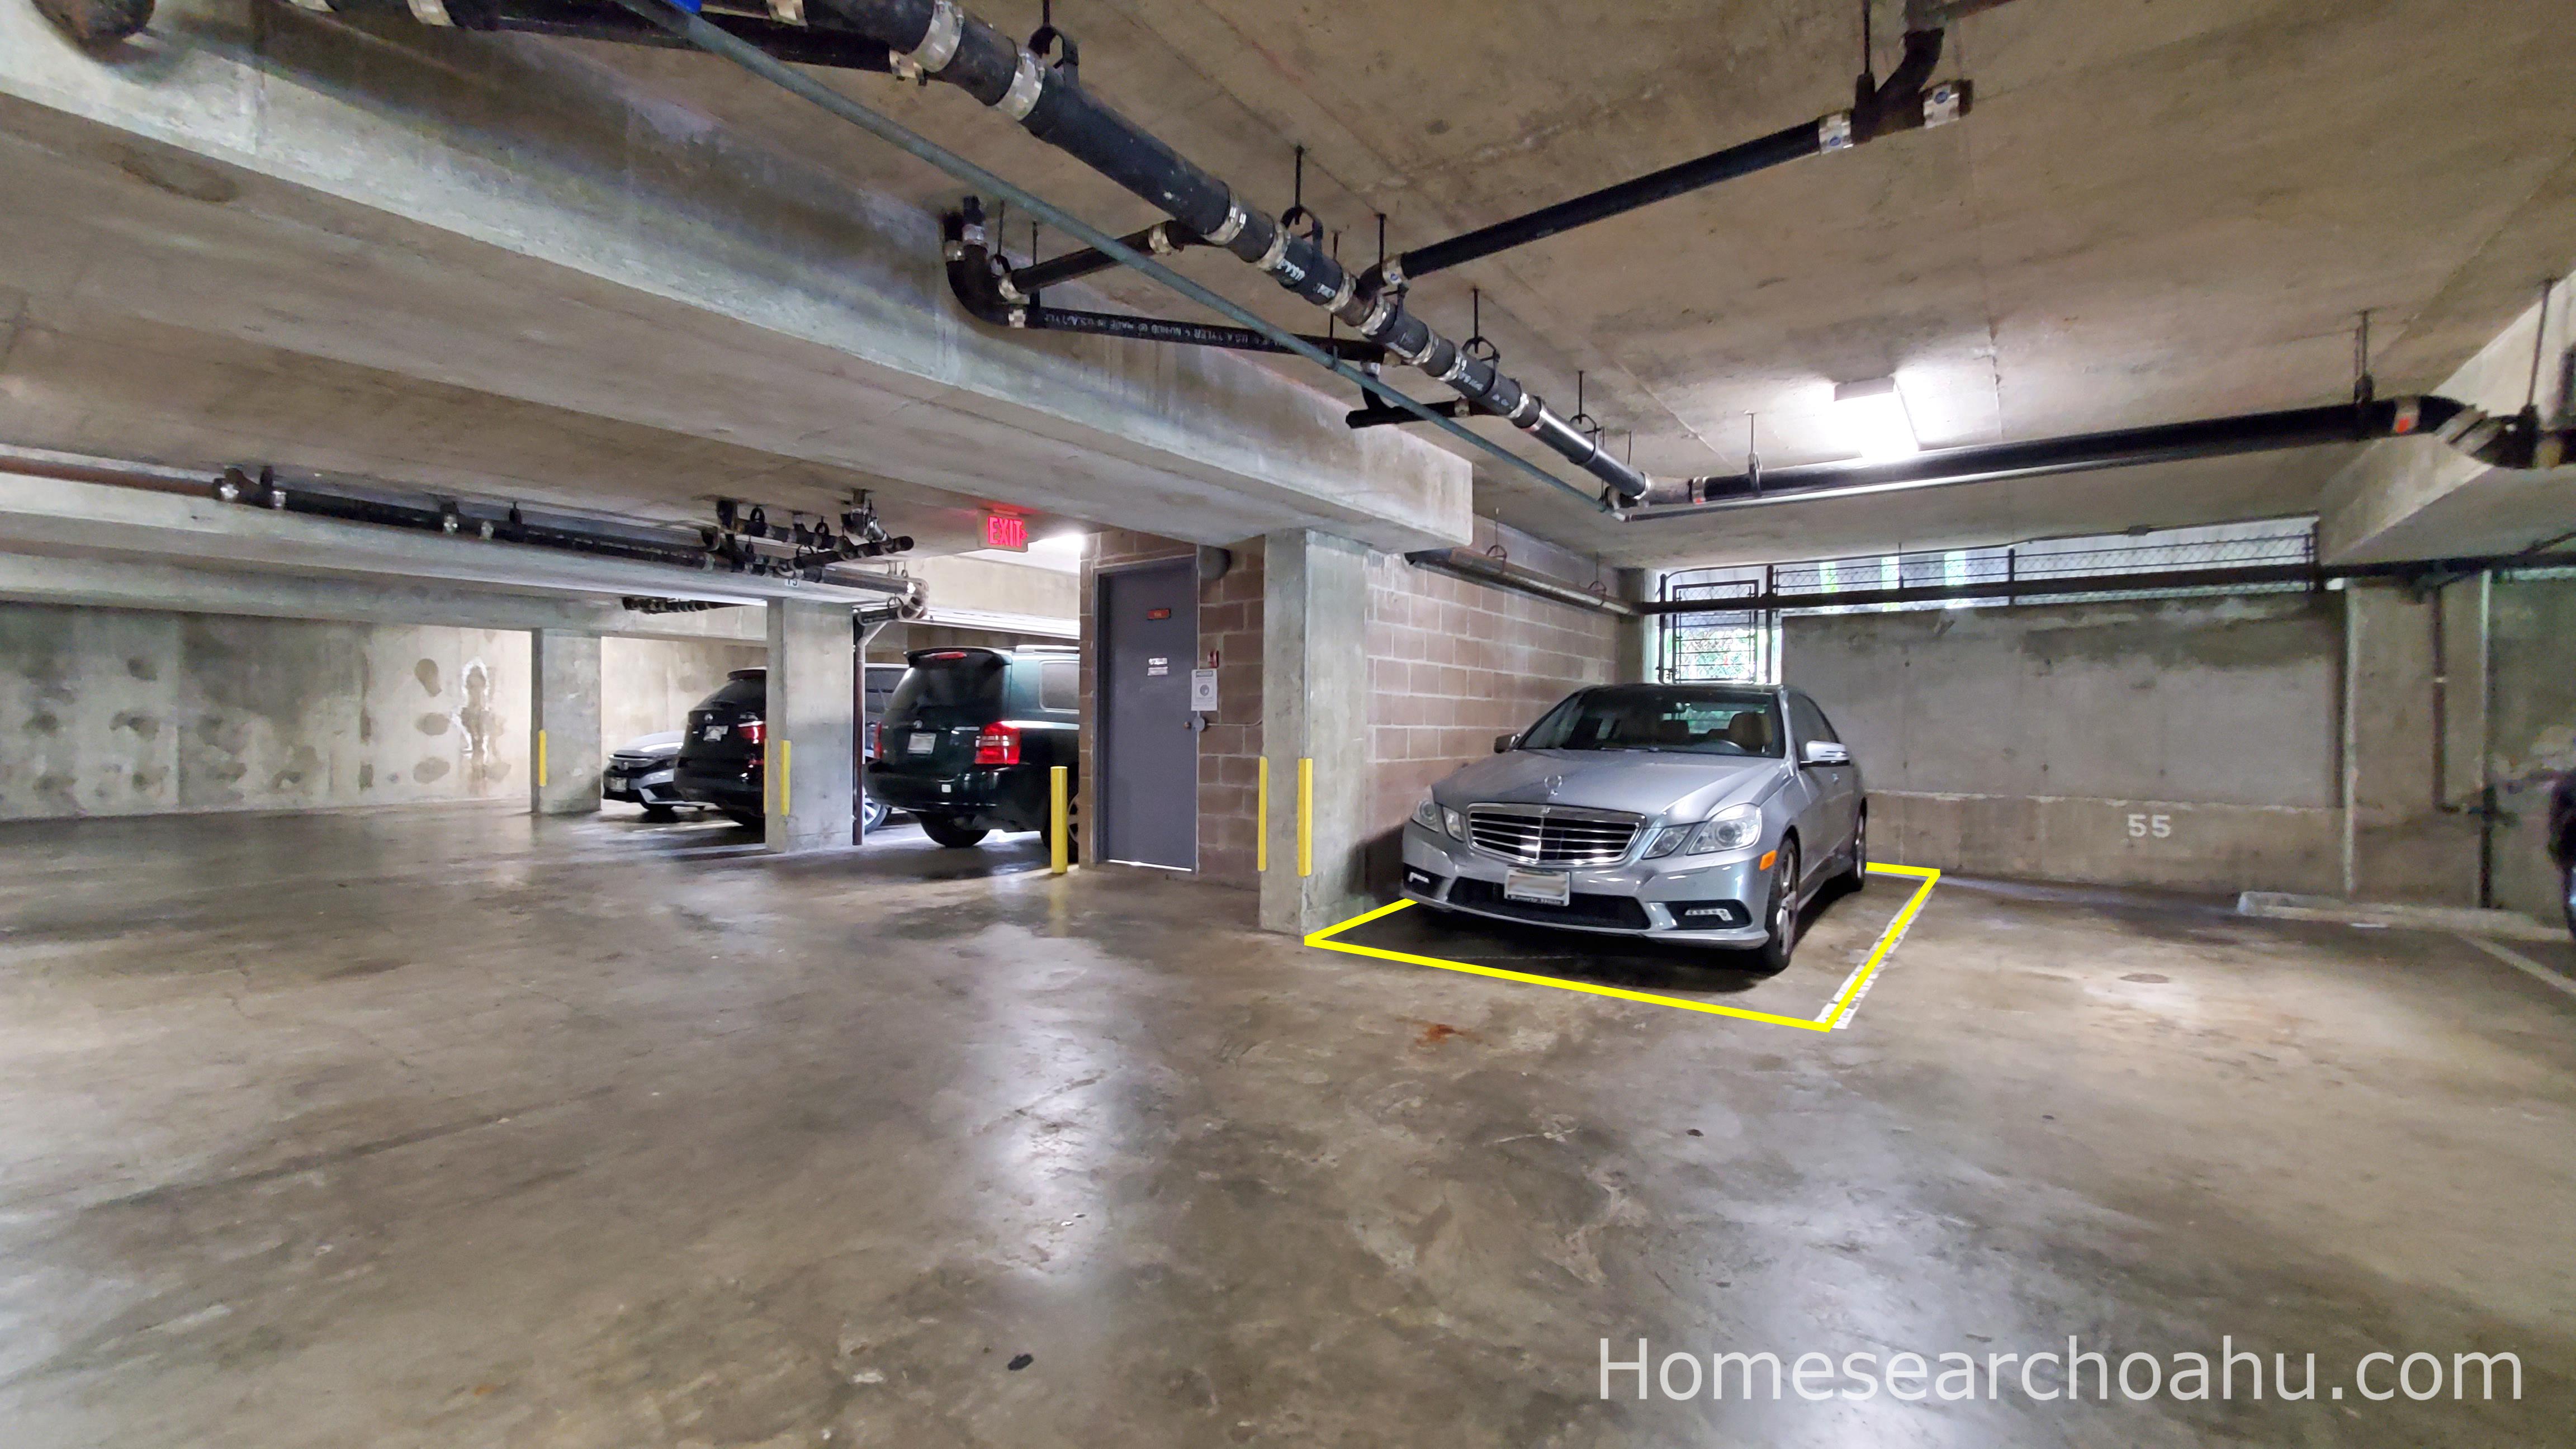 Leilehua 105 Parking